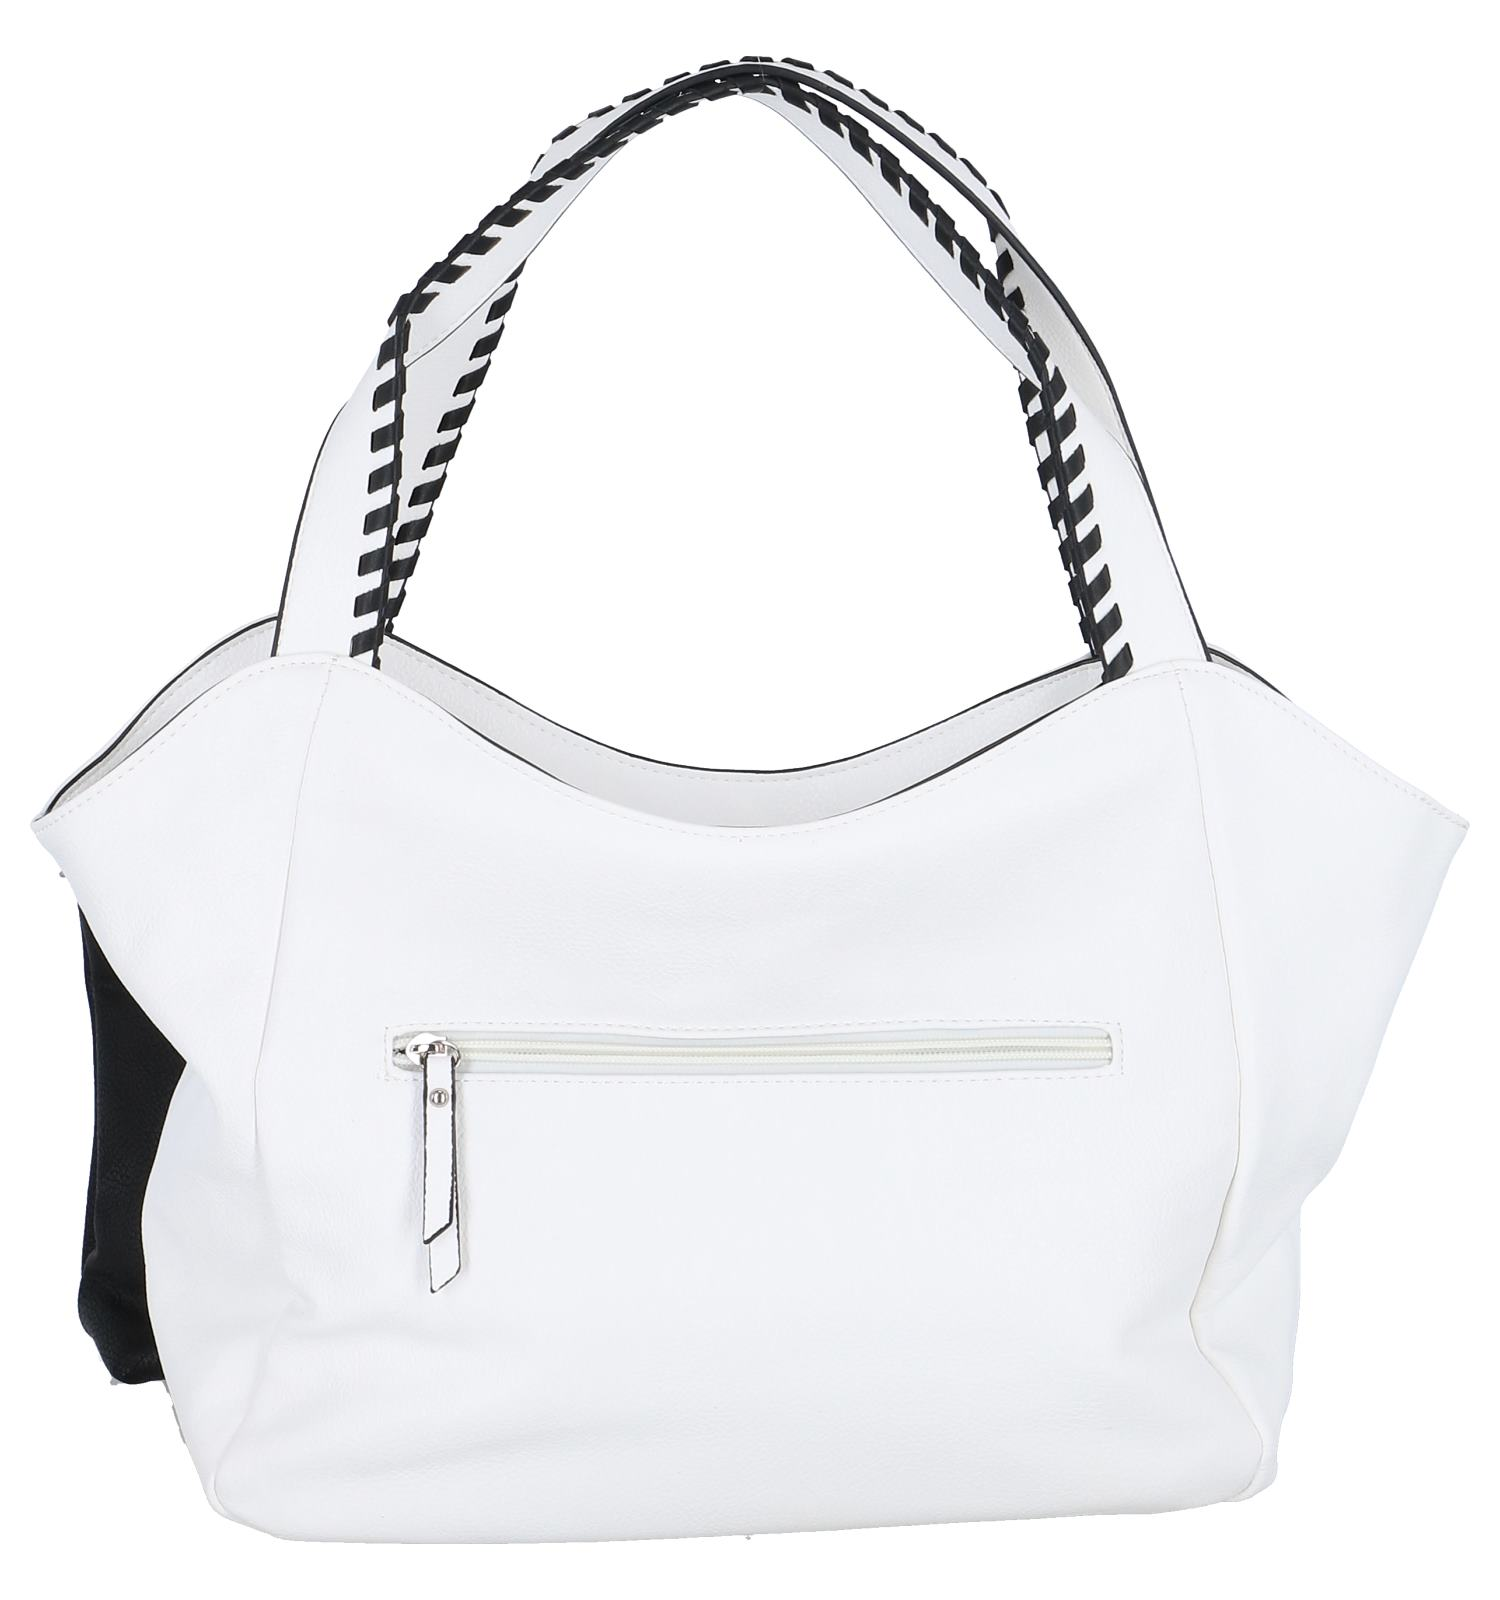 Witte Bag in Bag Schoudertas Emily & Noah | SCHOENENTORFS.NL